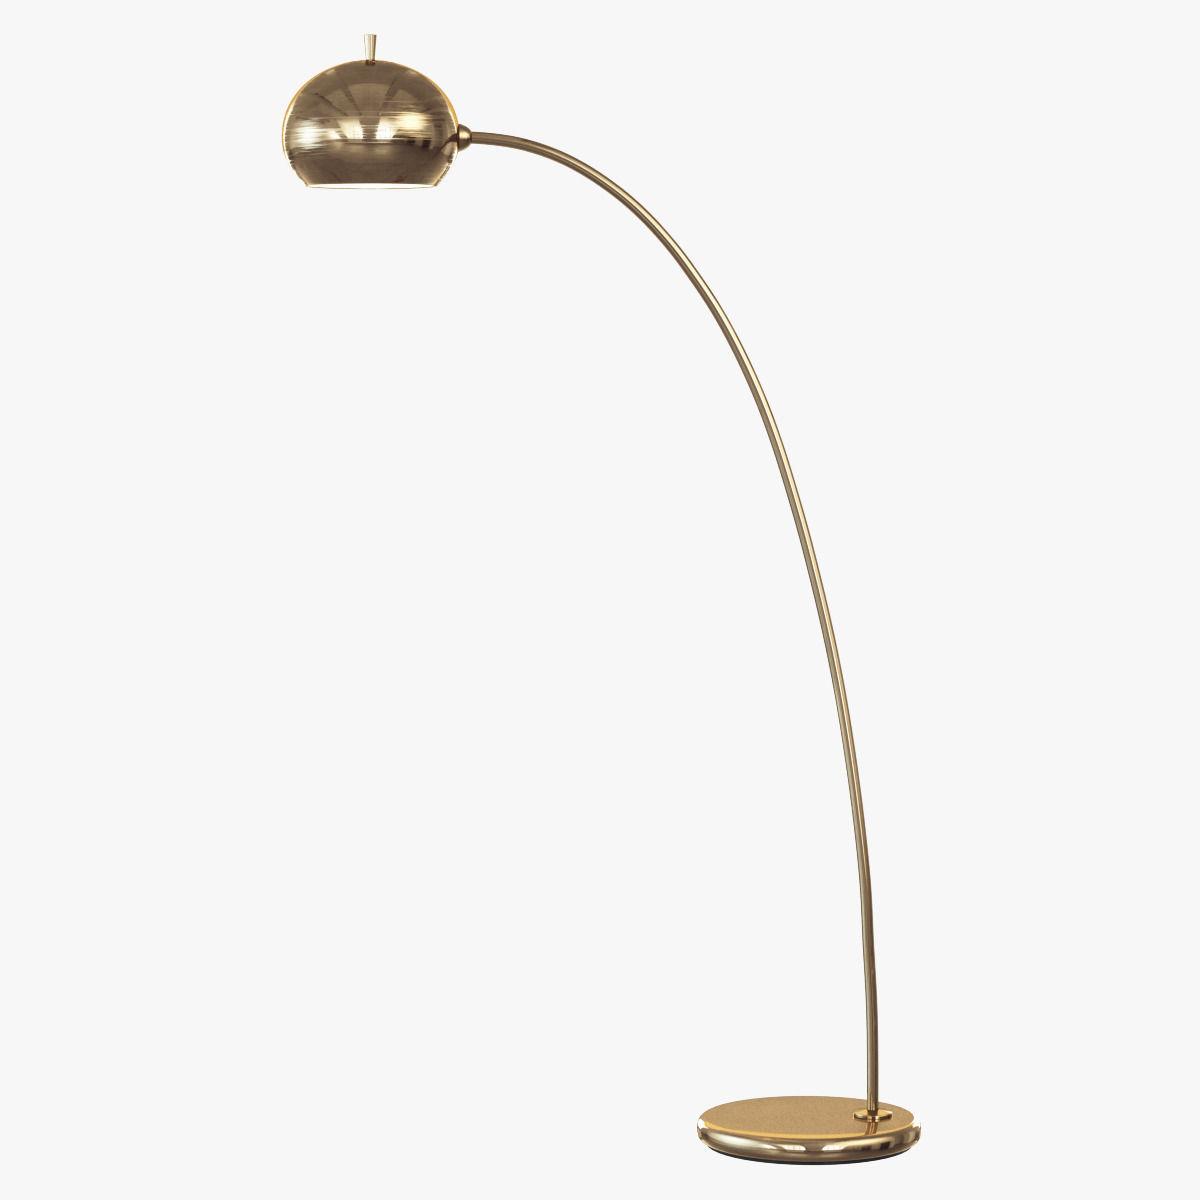 Petite arc metal floor lamp 3d model max obj 3ds fbx for Floor lamp 3ds max free model